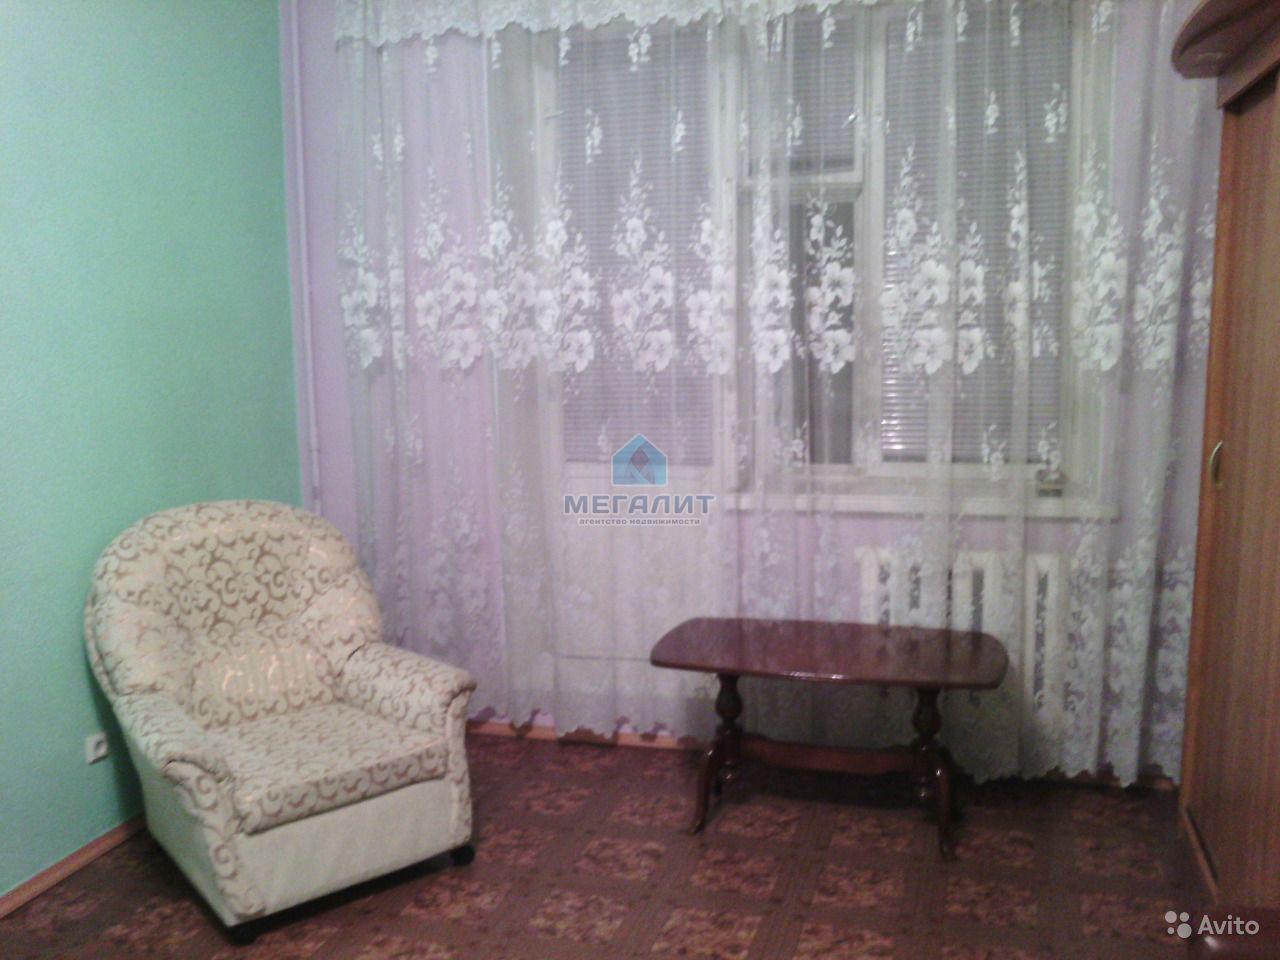 Аренда 1-к квартиры Братьев Касимовых 6А, 45.0 м² (миниатюра №4)